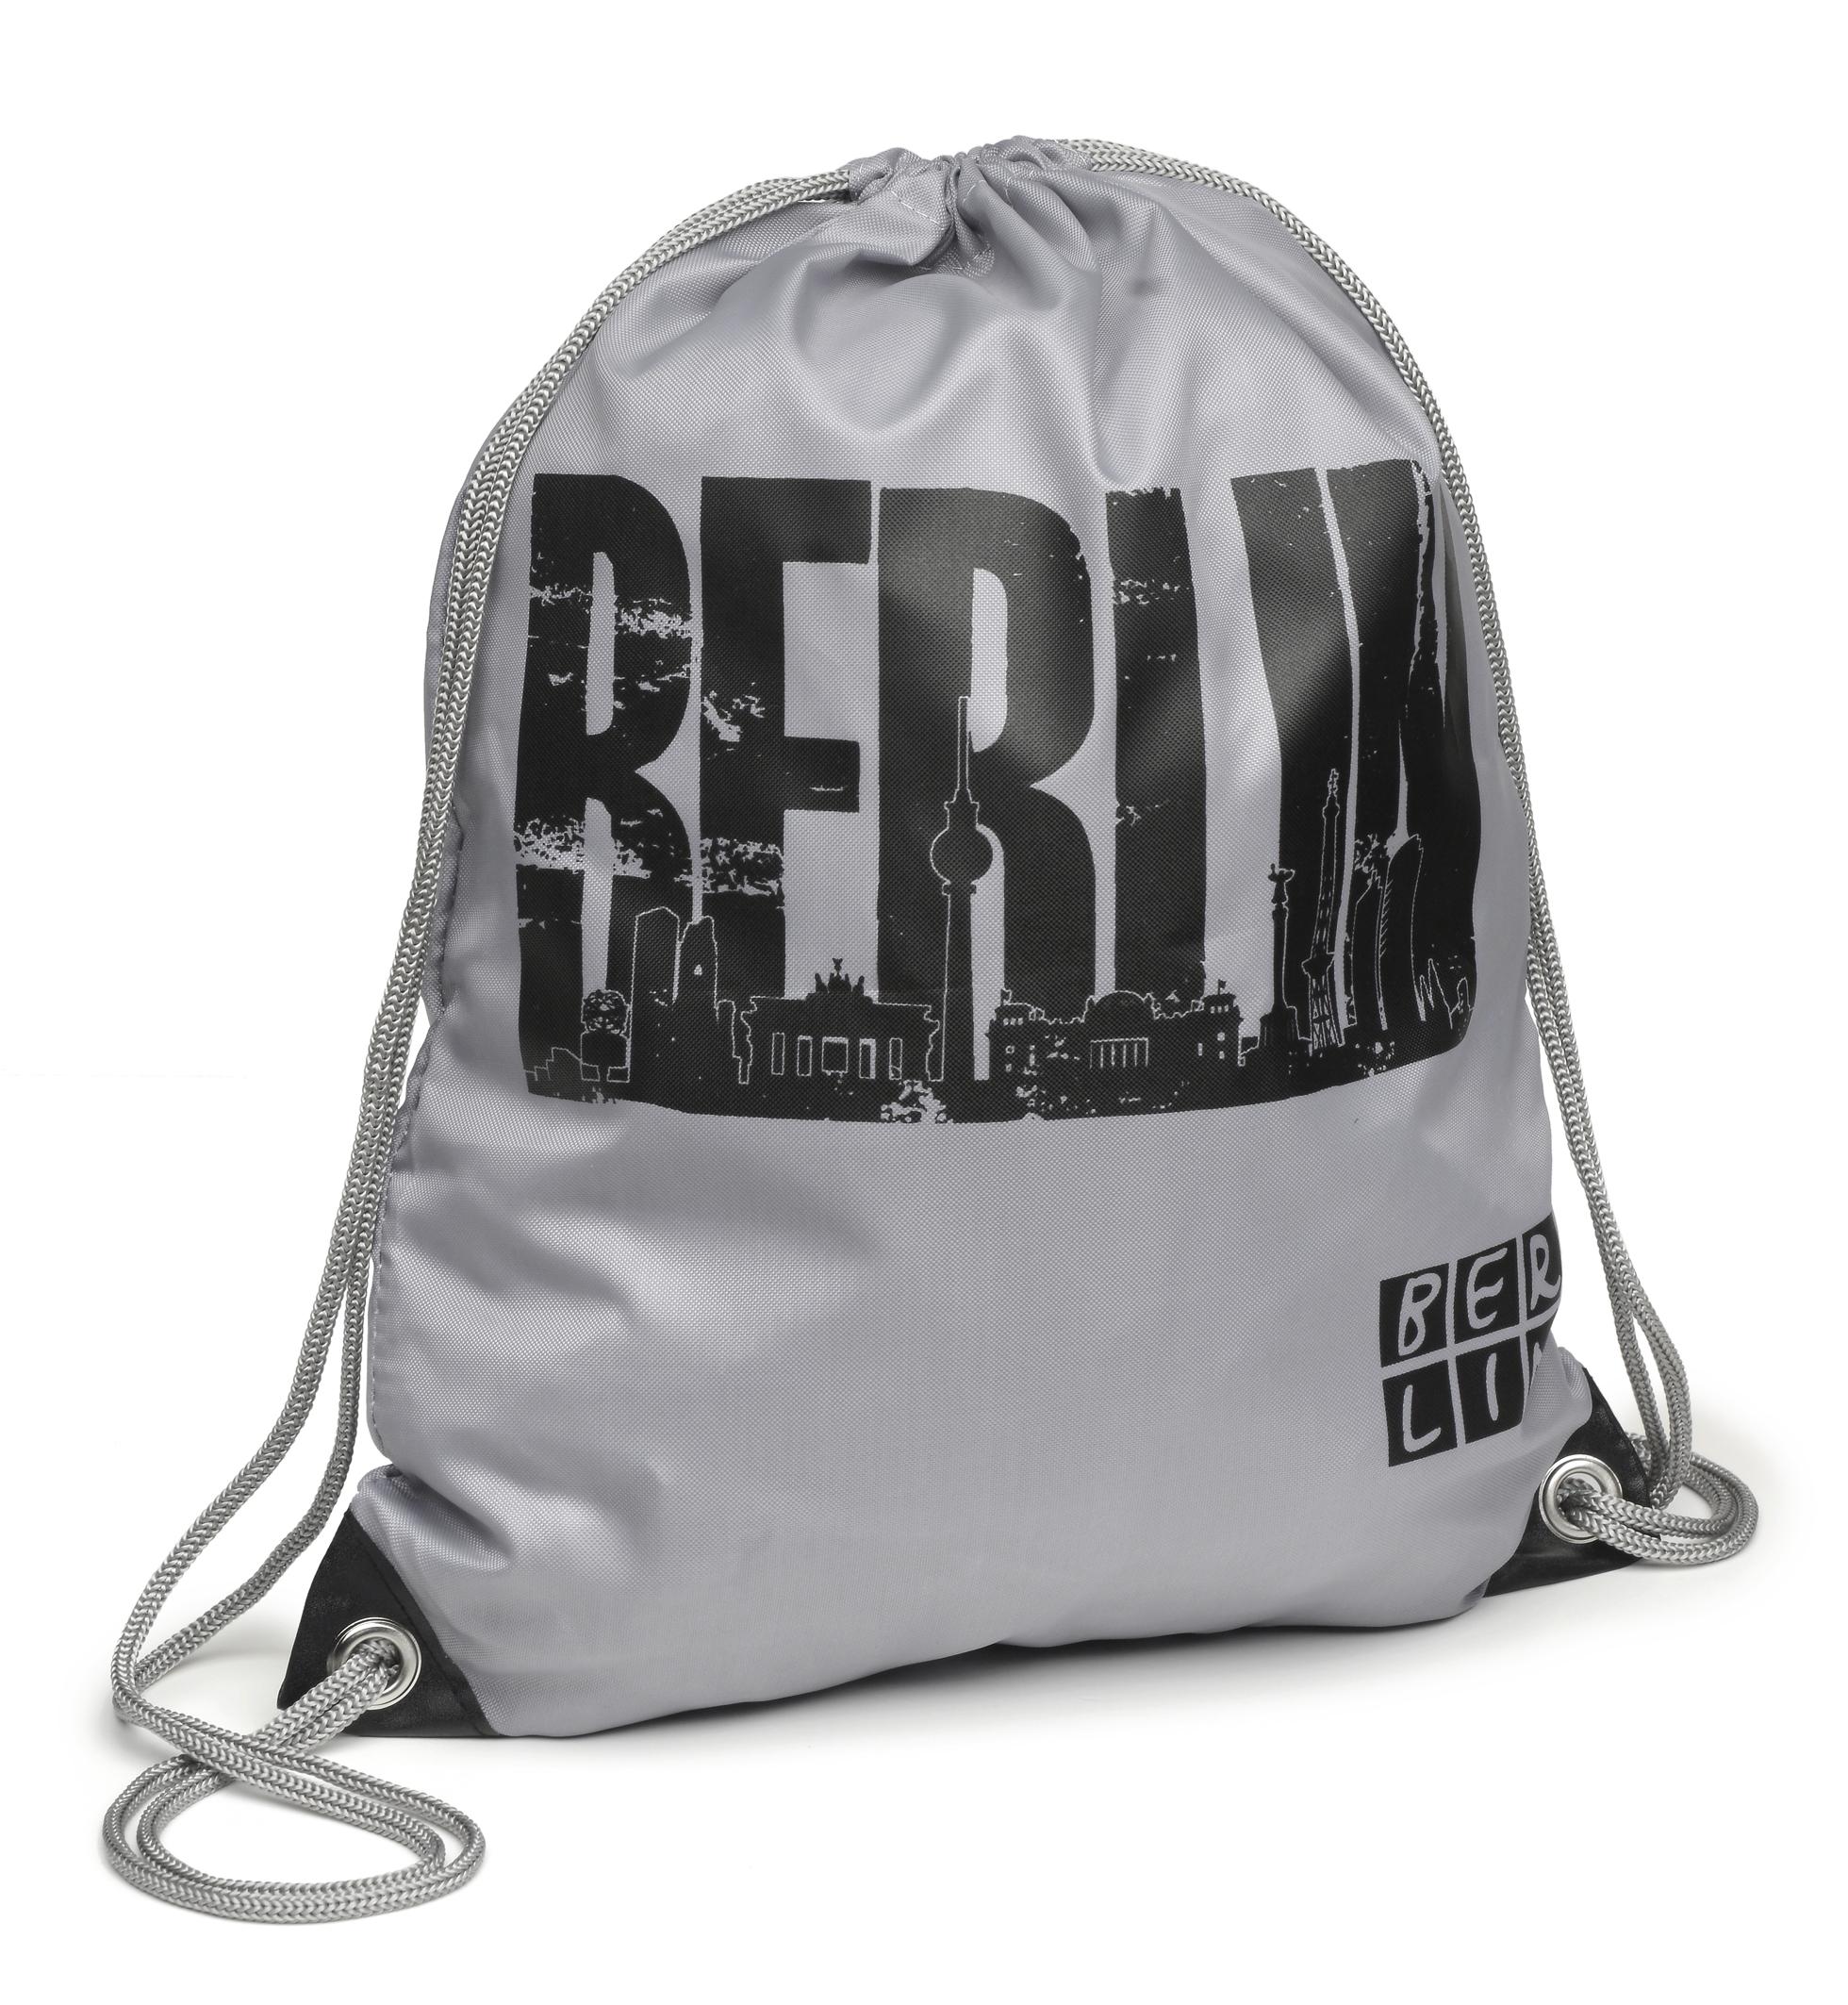 Sportbeutel BERLIN Skyline grau-schwarz